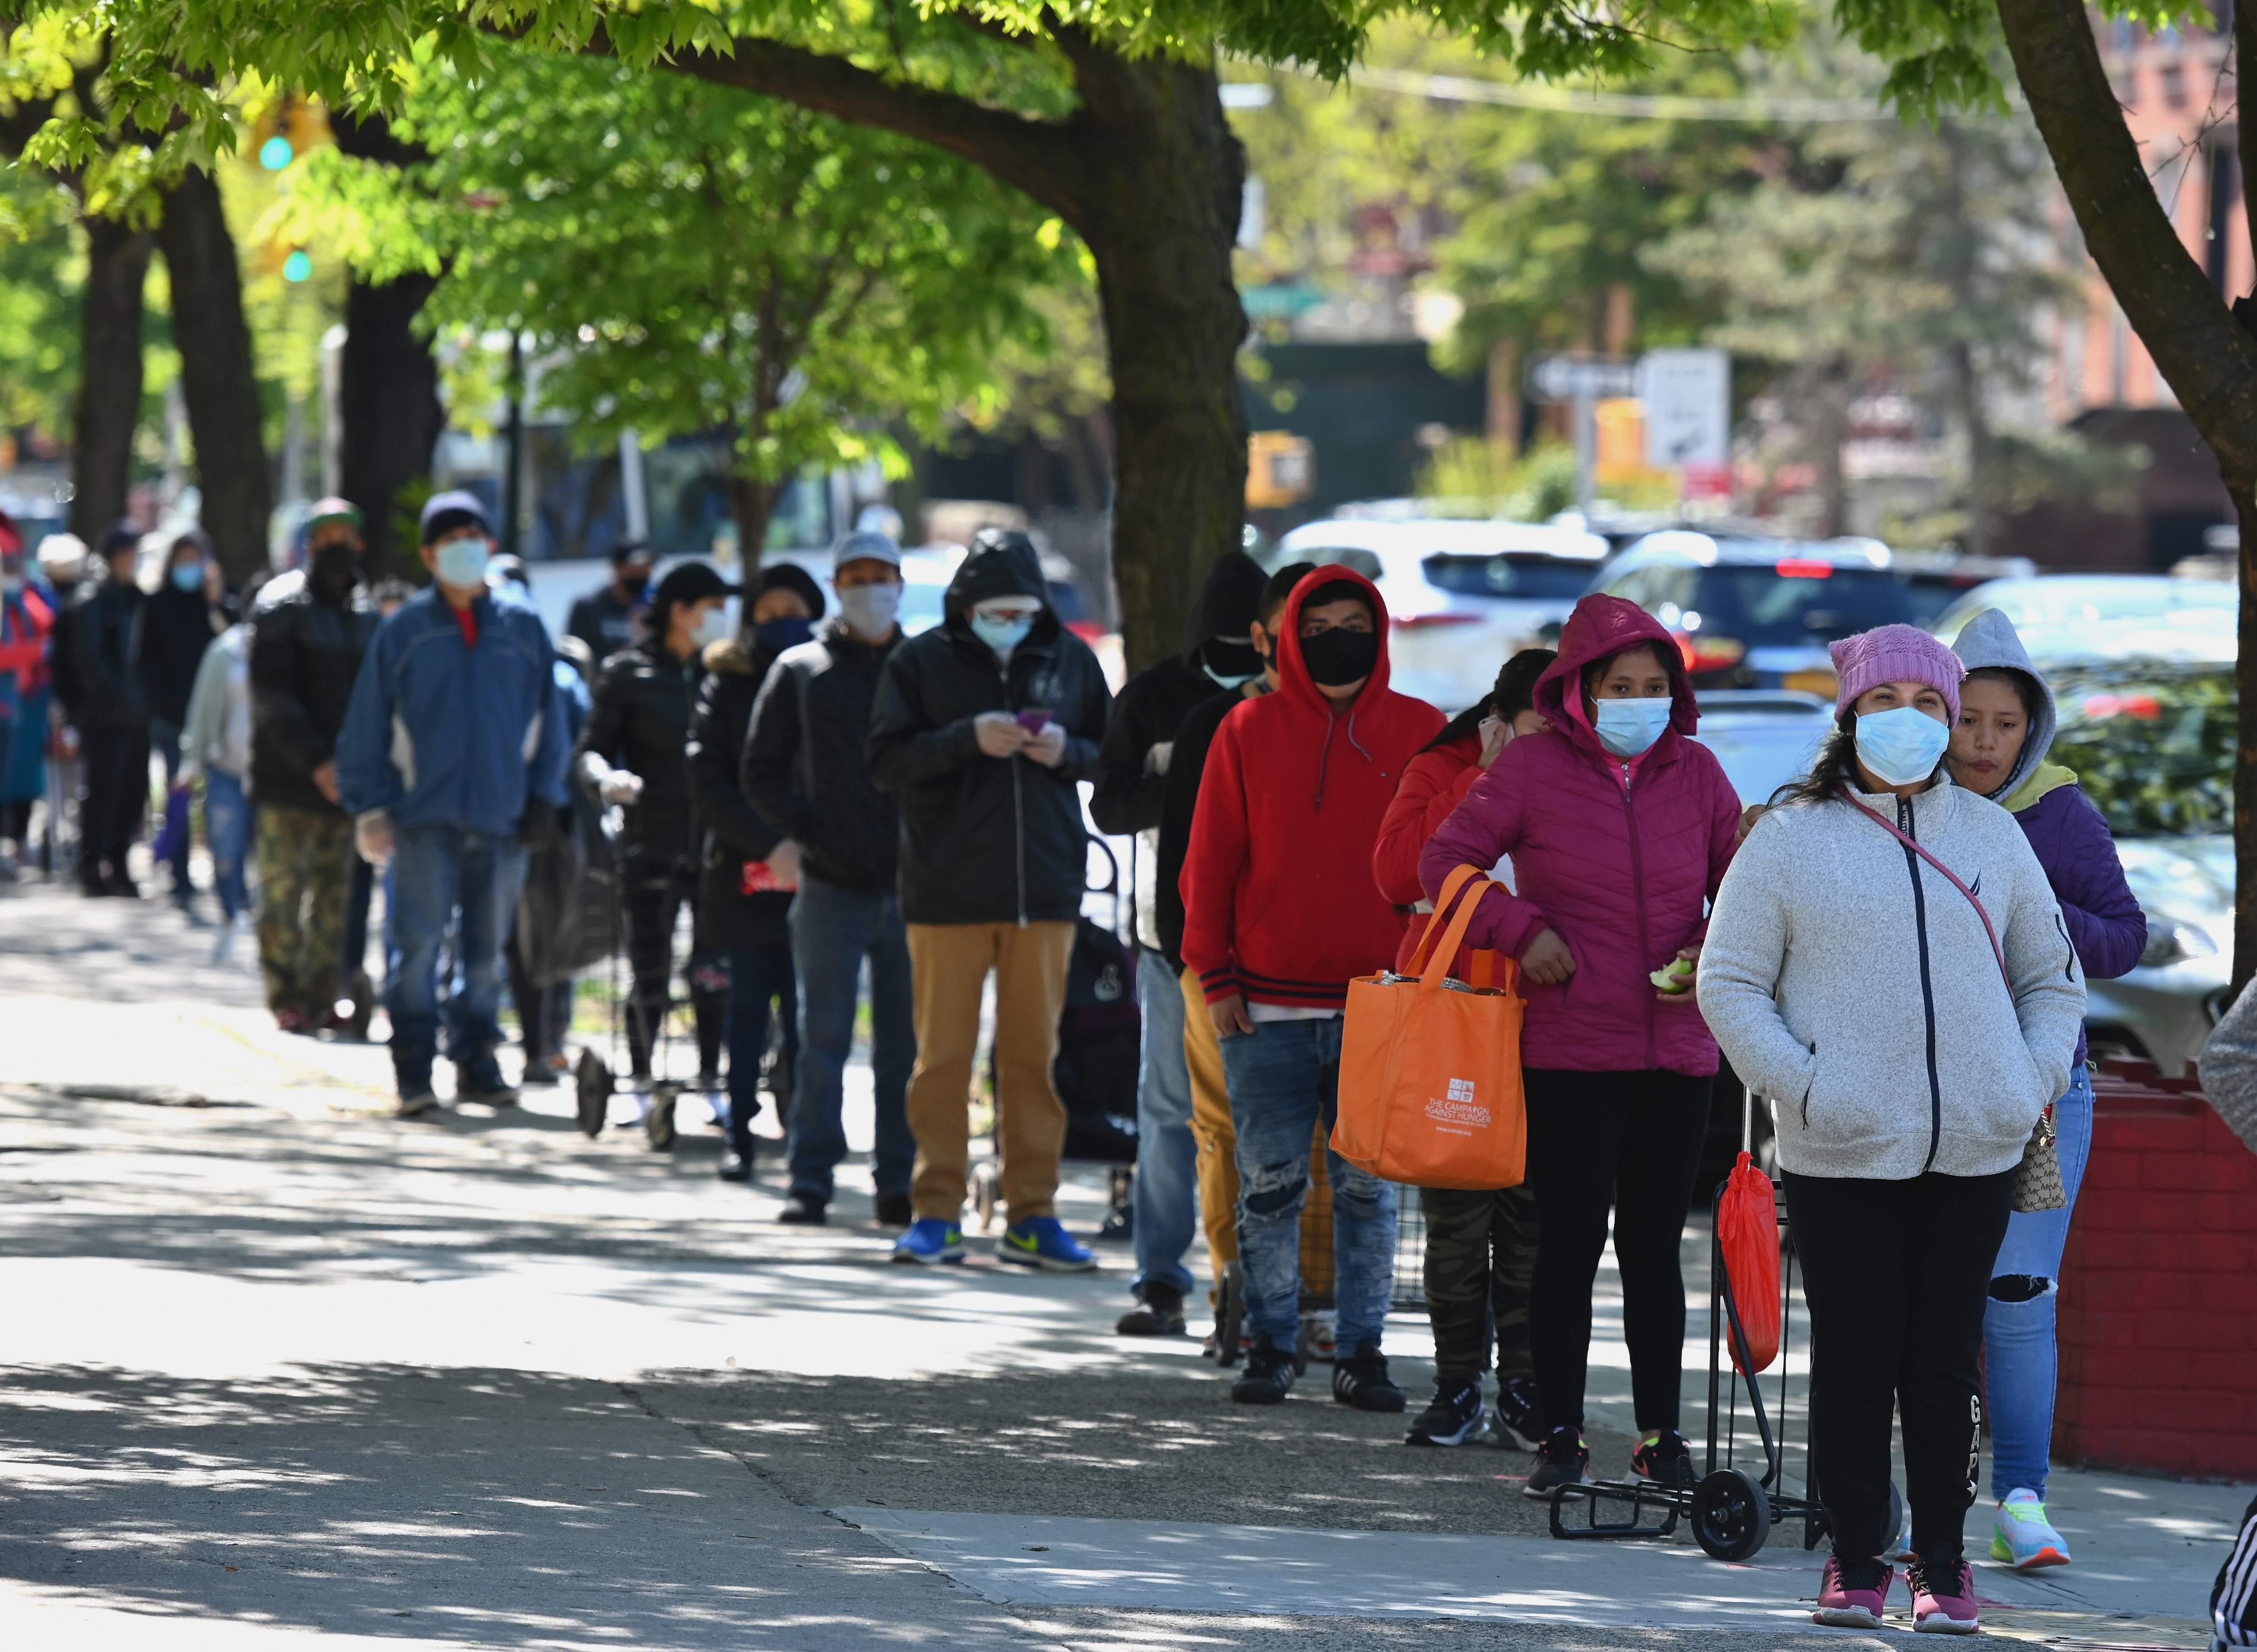 Coronavirus live updates: Court strikes down Wisconsin stay-at-home order, Matt Damon s daughter had virus  early on  and recovered